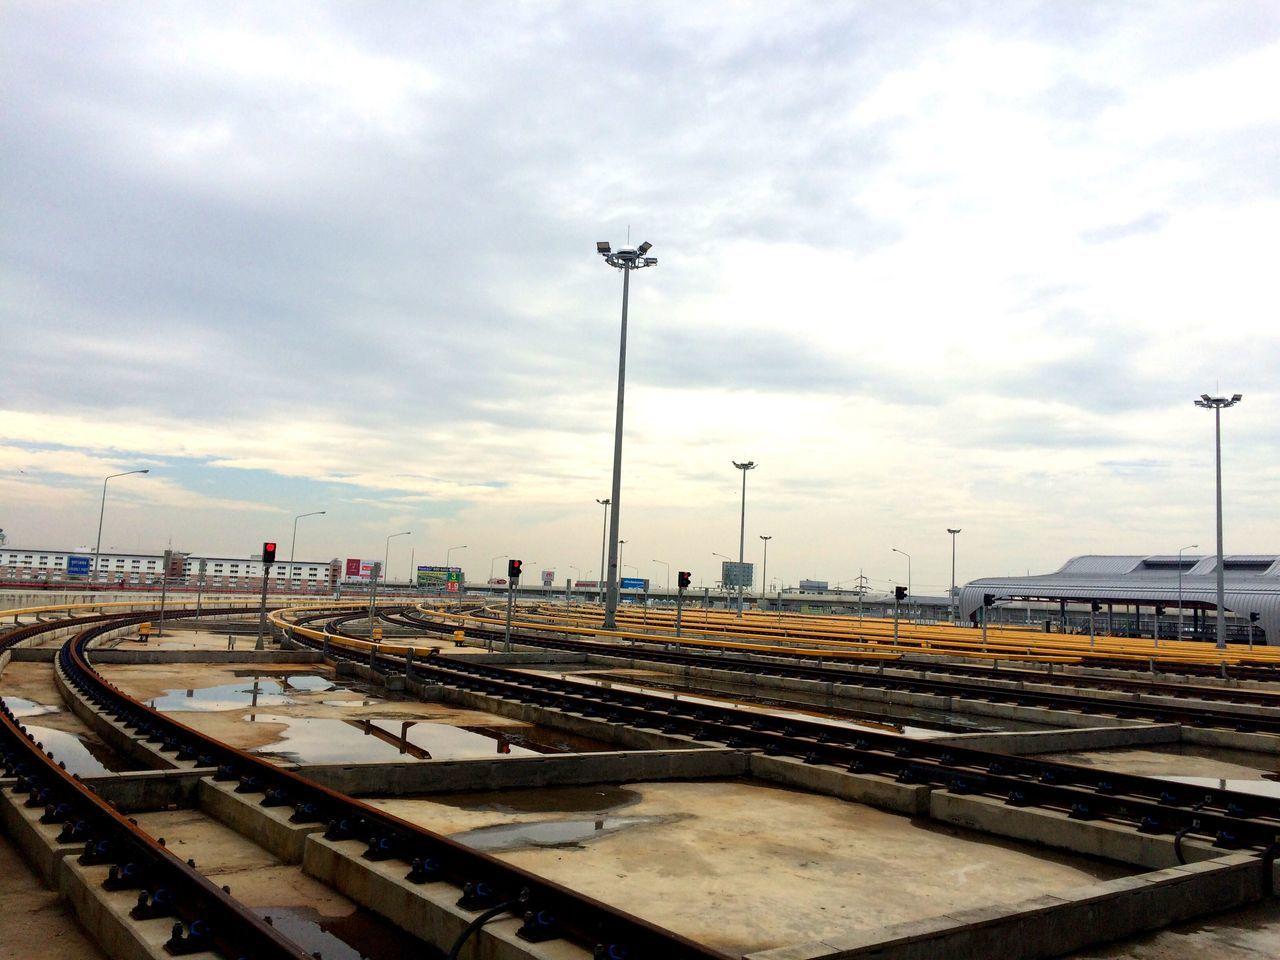 We ❤️ Thailand Transportation Sky Railroad Track Rail Transportation No People Cloud - Sky Outdoors Day Public Transportation Architecture